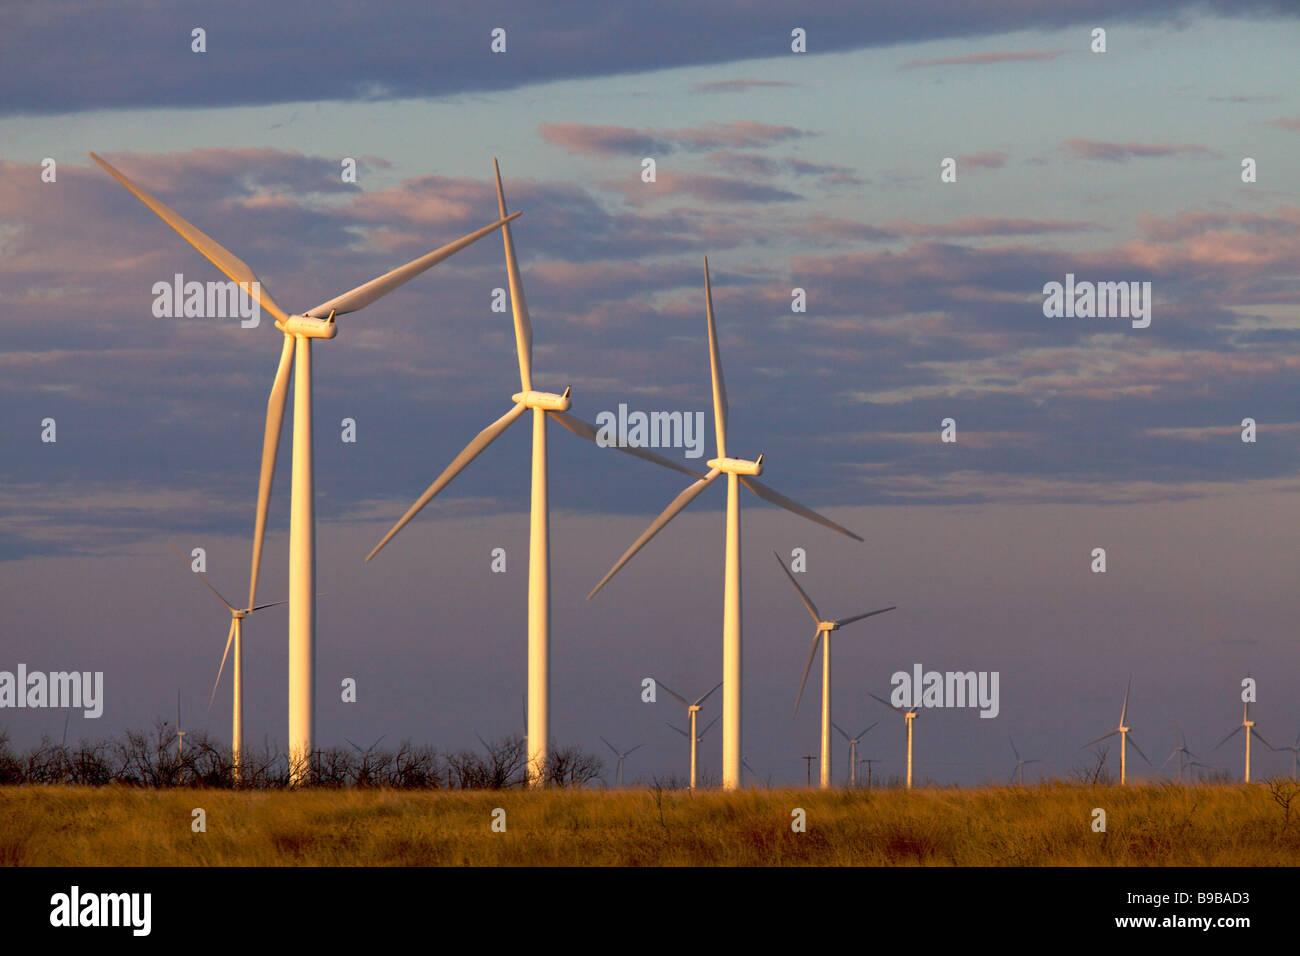 Am frühen Morgen an der Stromerzeugung an Horse Hollow Wind Farm Nolan county Texas Windenergieanlagen Stockbild